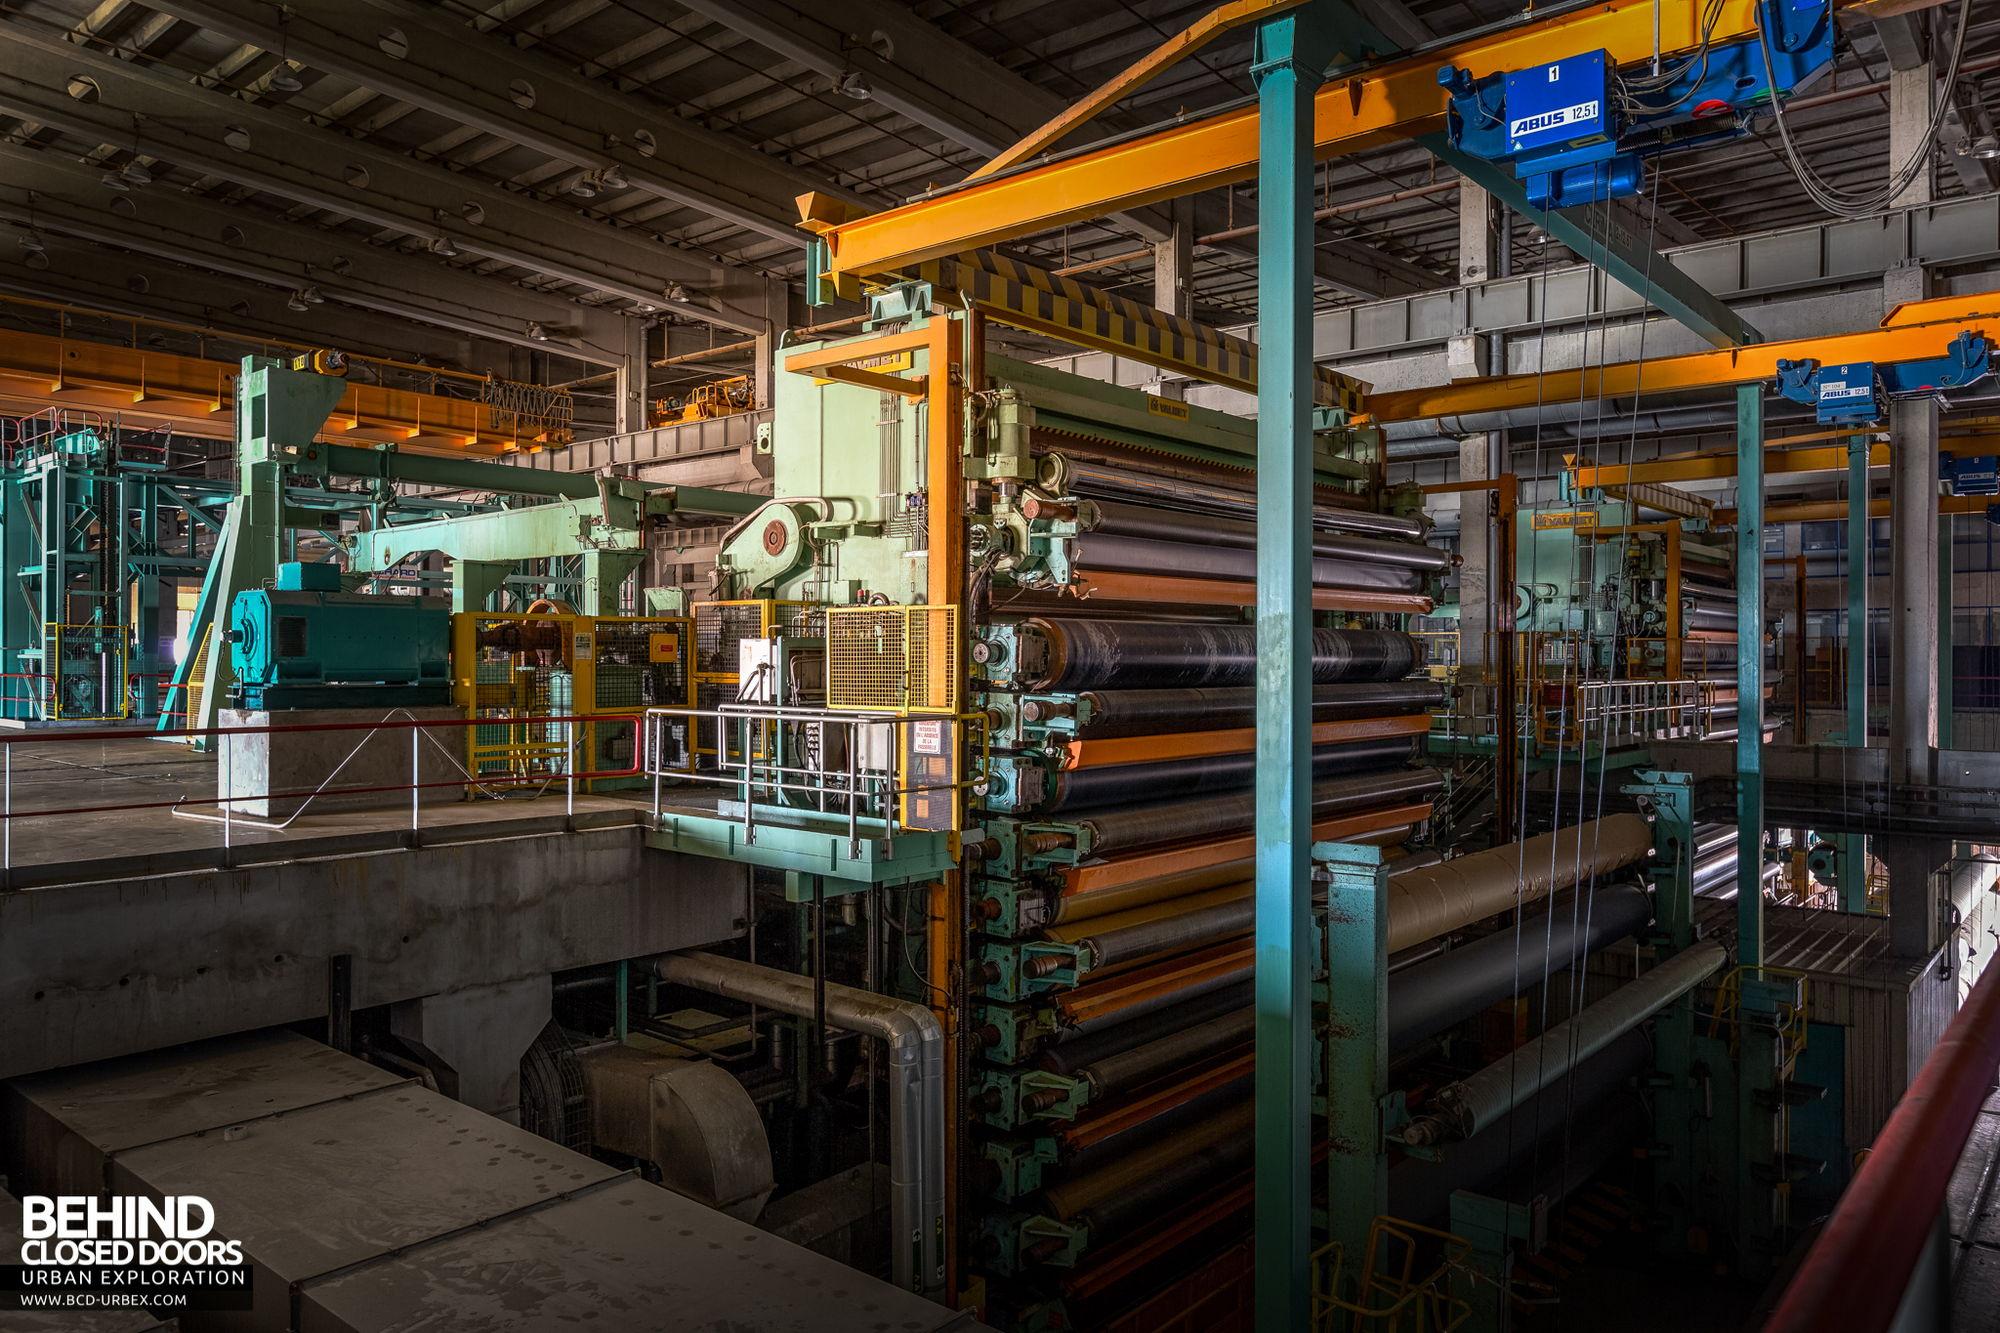 Stora Enso, Corbehem - Top of the huge calender's roller assembly